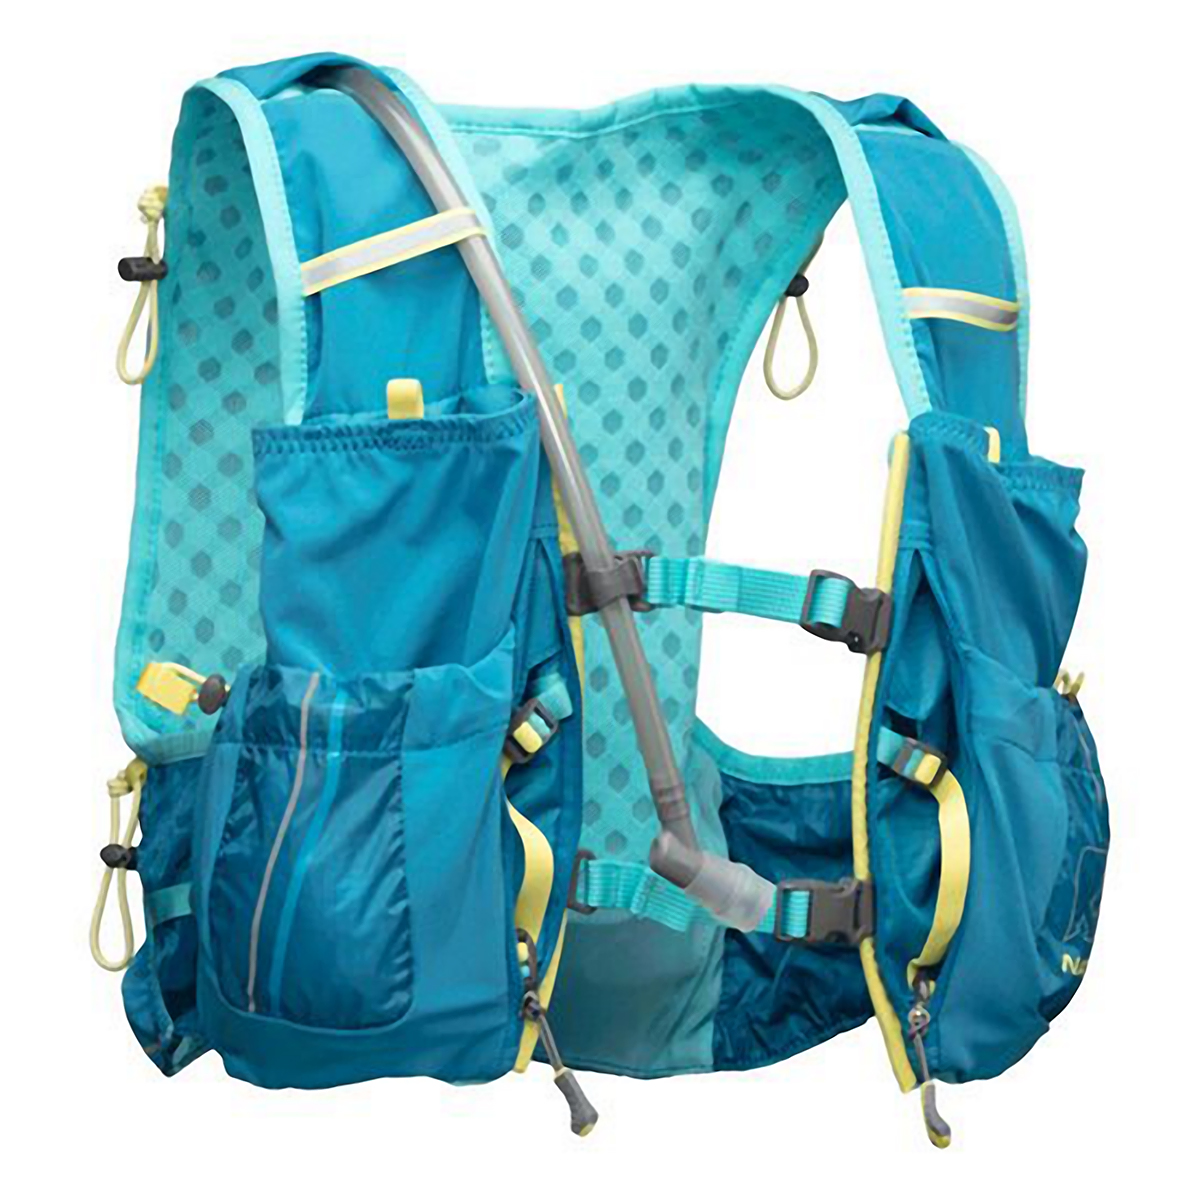 Nathan Vaporairess 2.0 7 Liter Hydration Pack - Color: Blue Jay/Blue Radiance - Size: XXS-M, Blue Jay/Blue Radiance, large, image 1